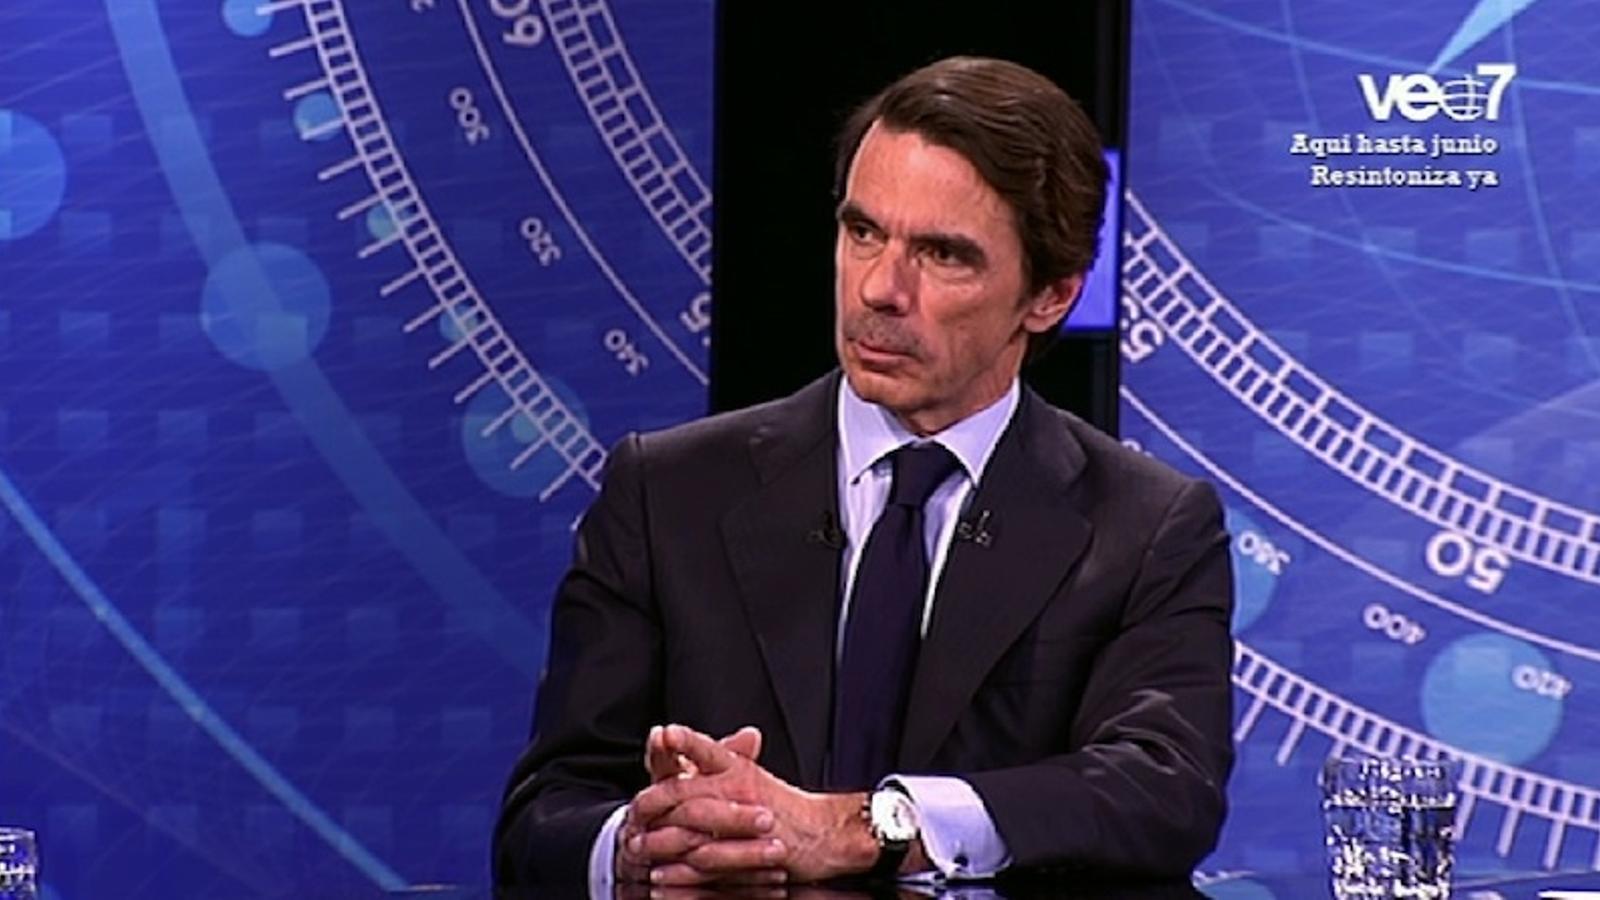 Aznar no aconsella la deriva sobiranista de CiU